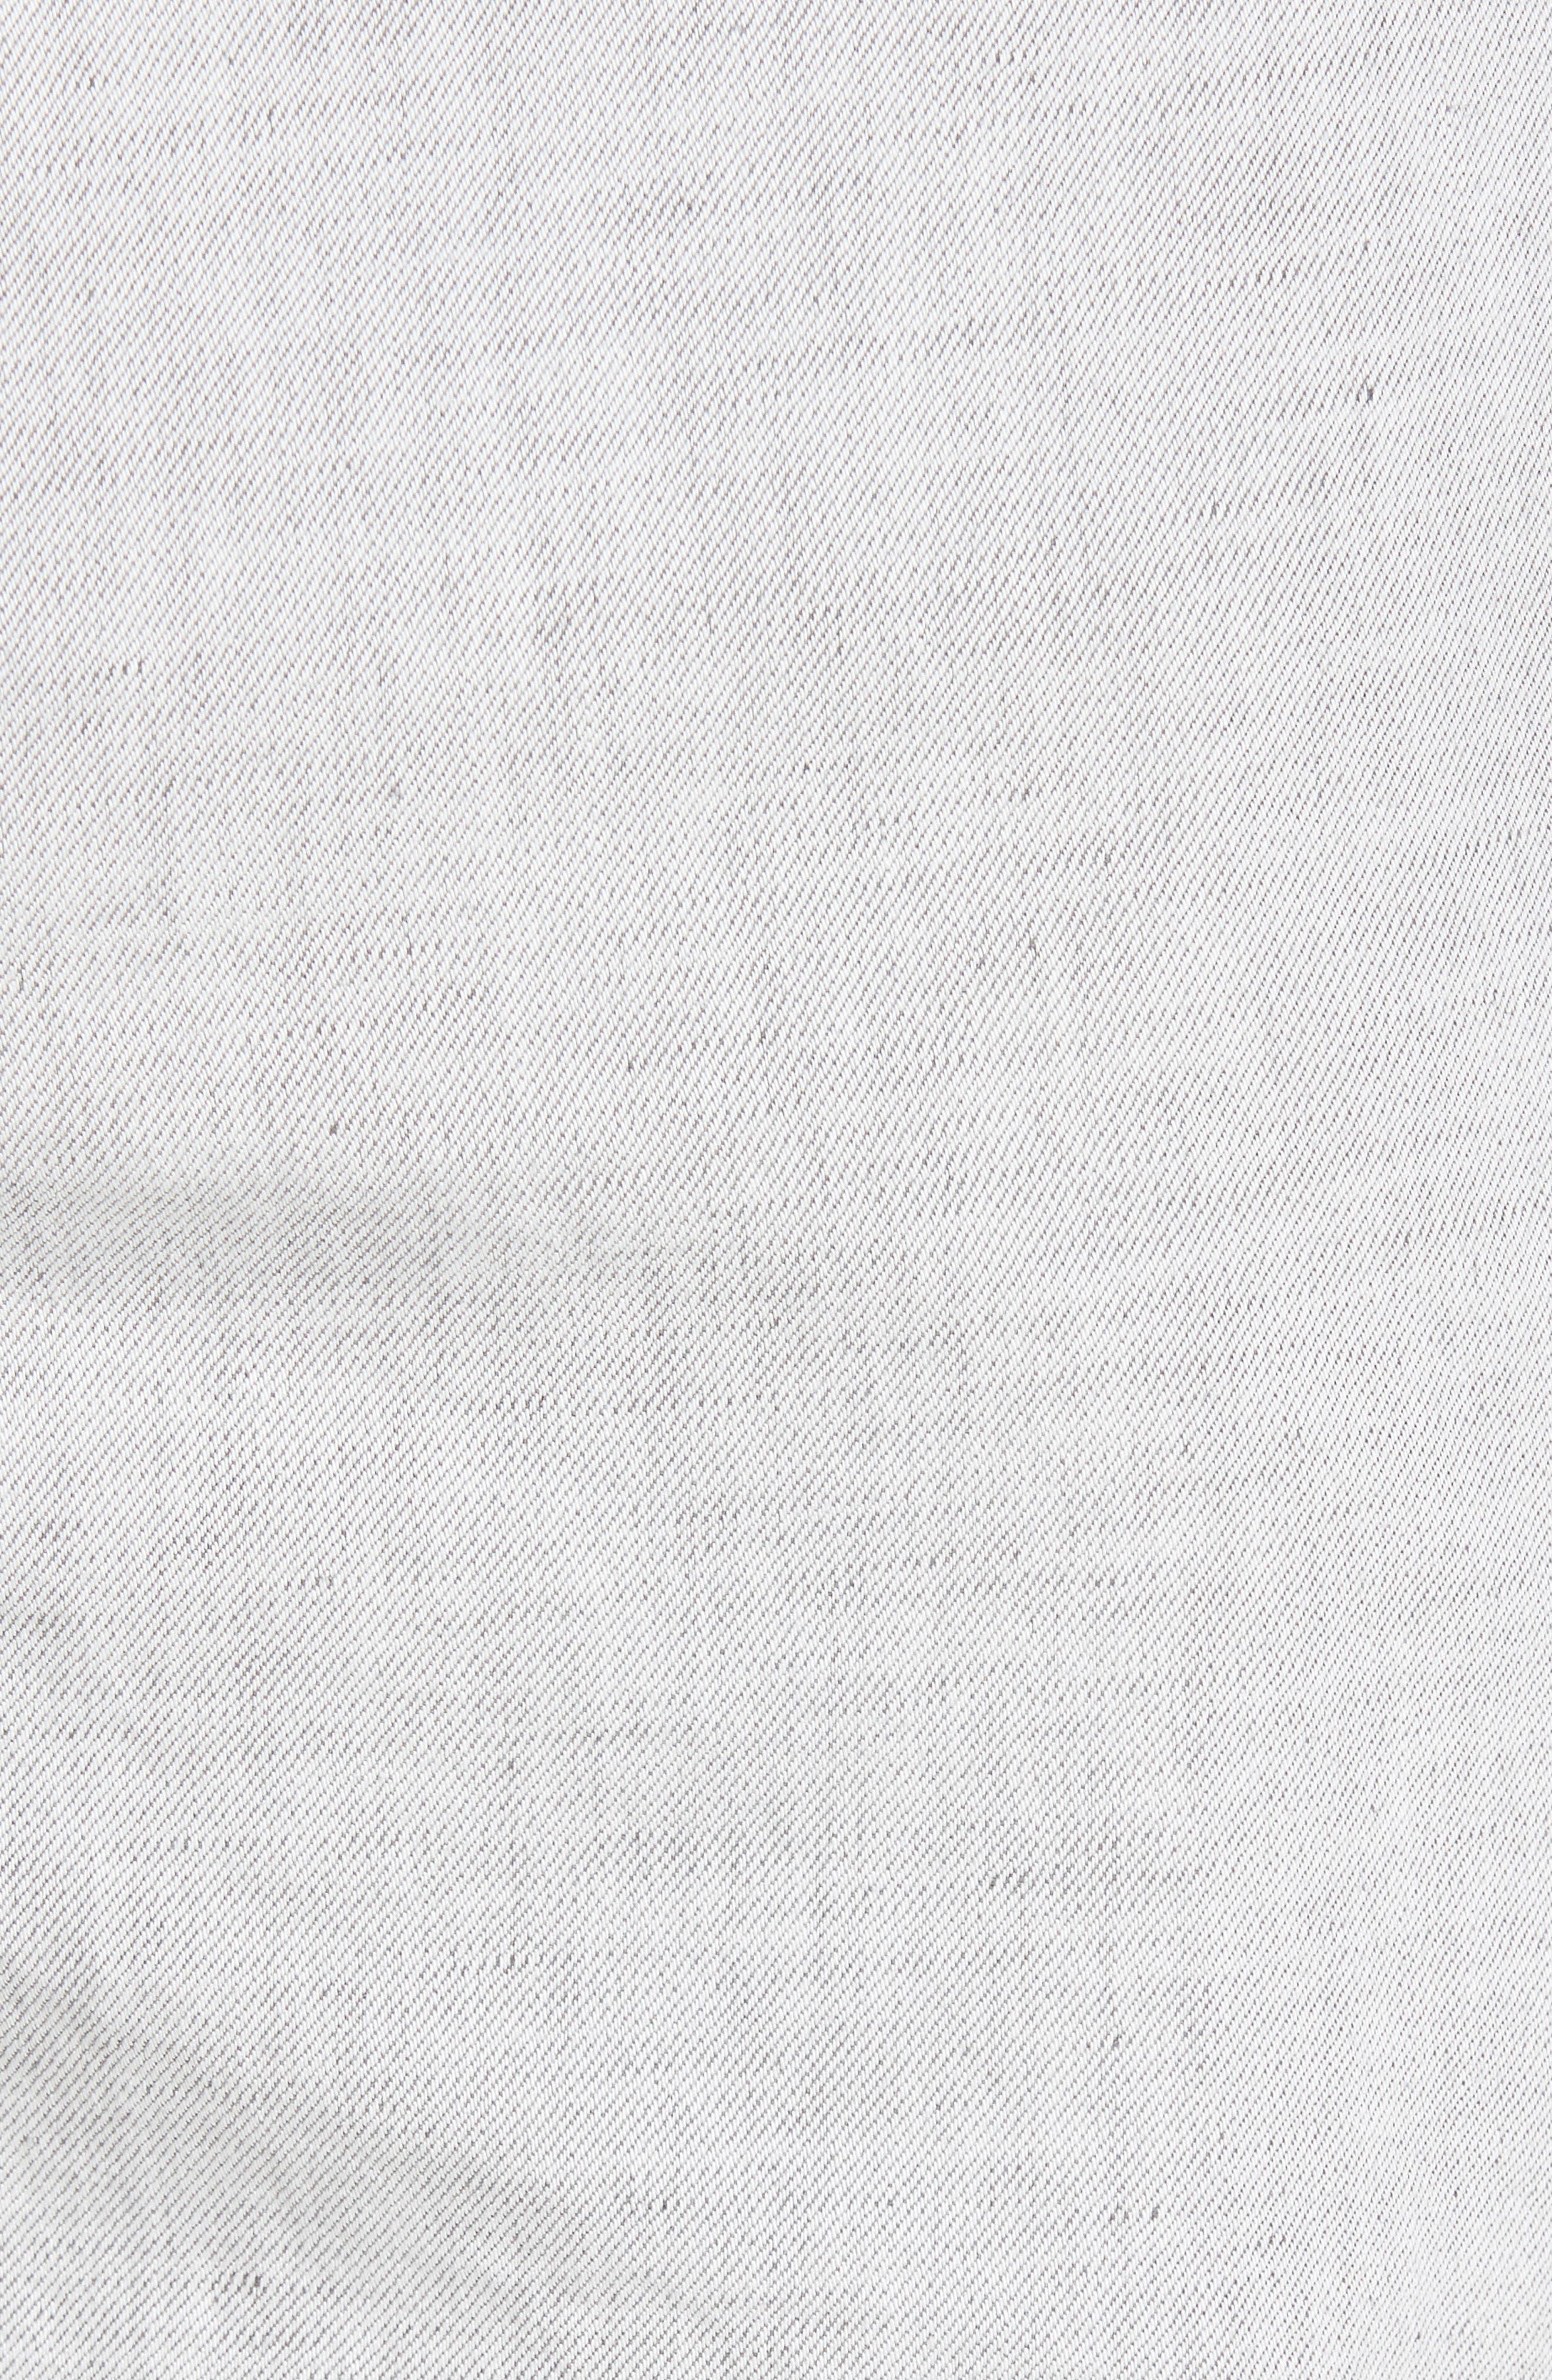 Frisho Cuff Denim Shorts,                             Alternate thumbnail 6, color,                             Light Grey